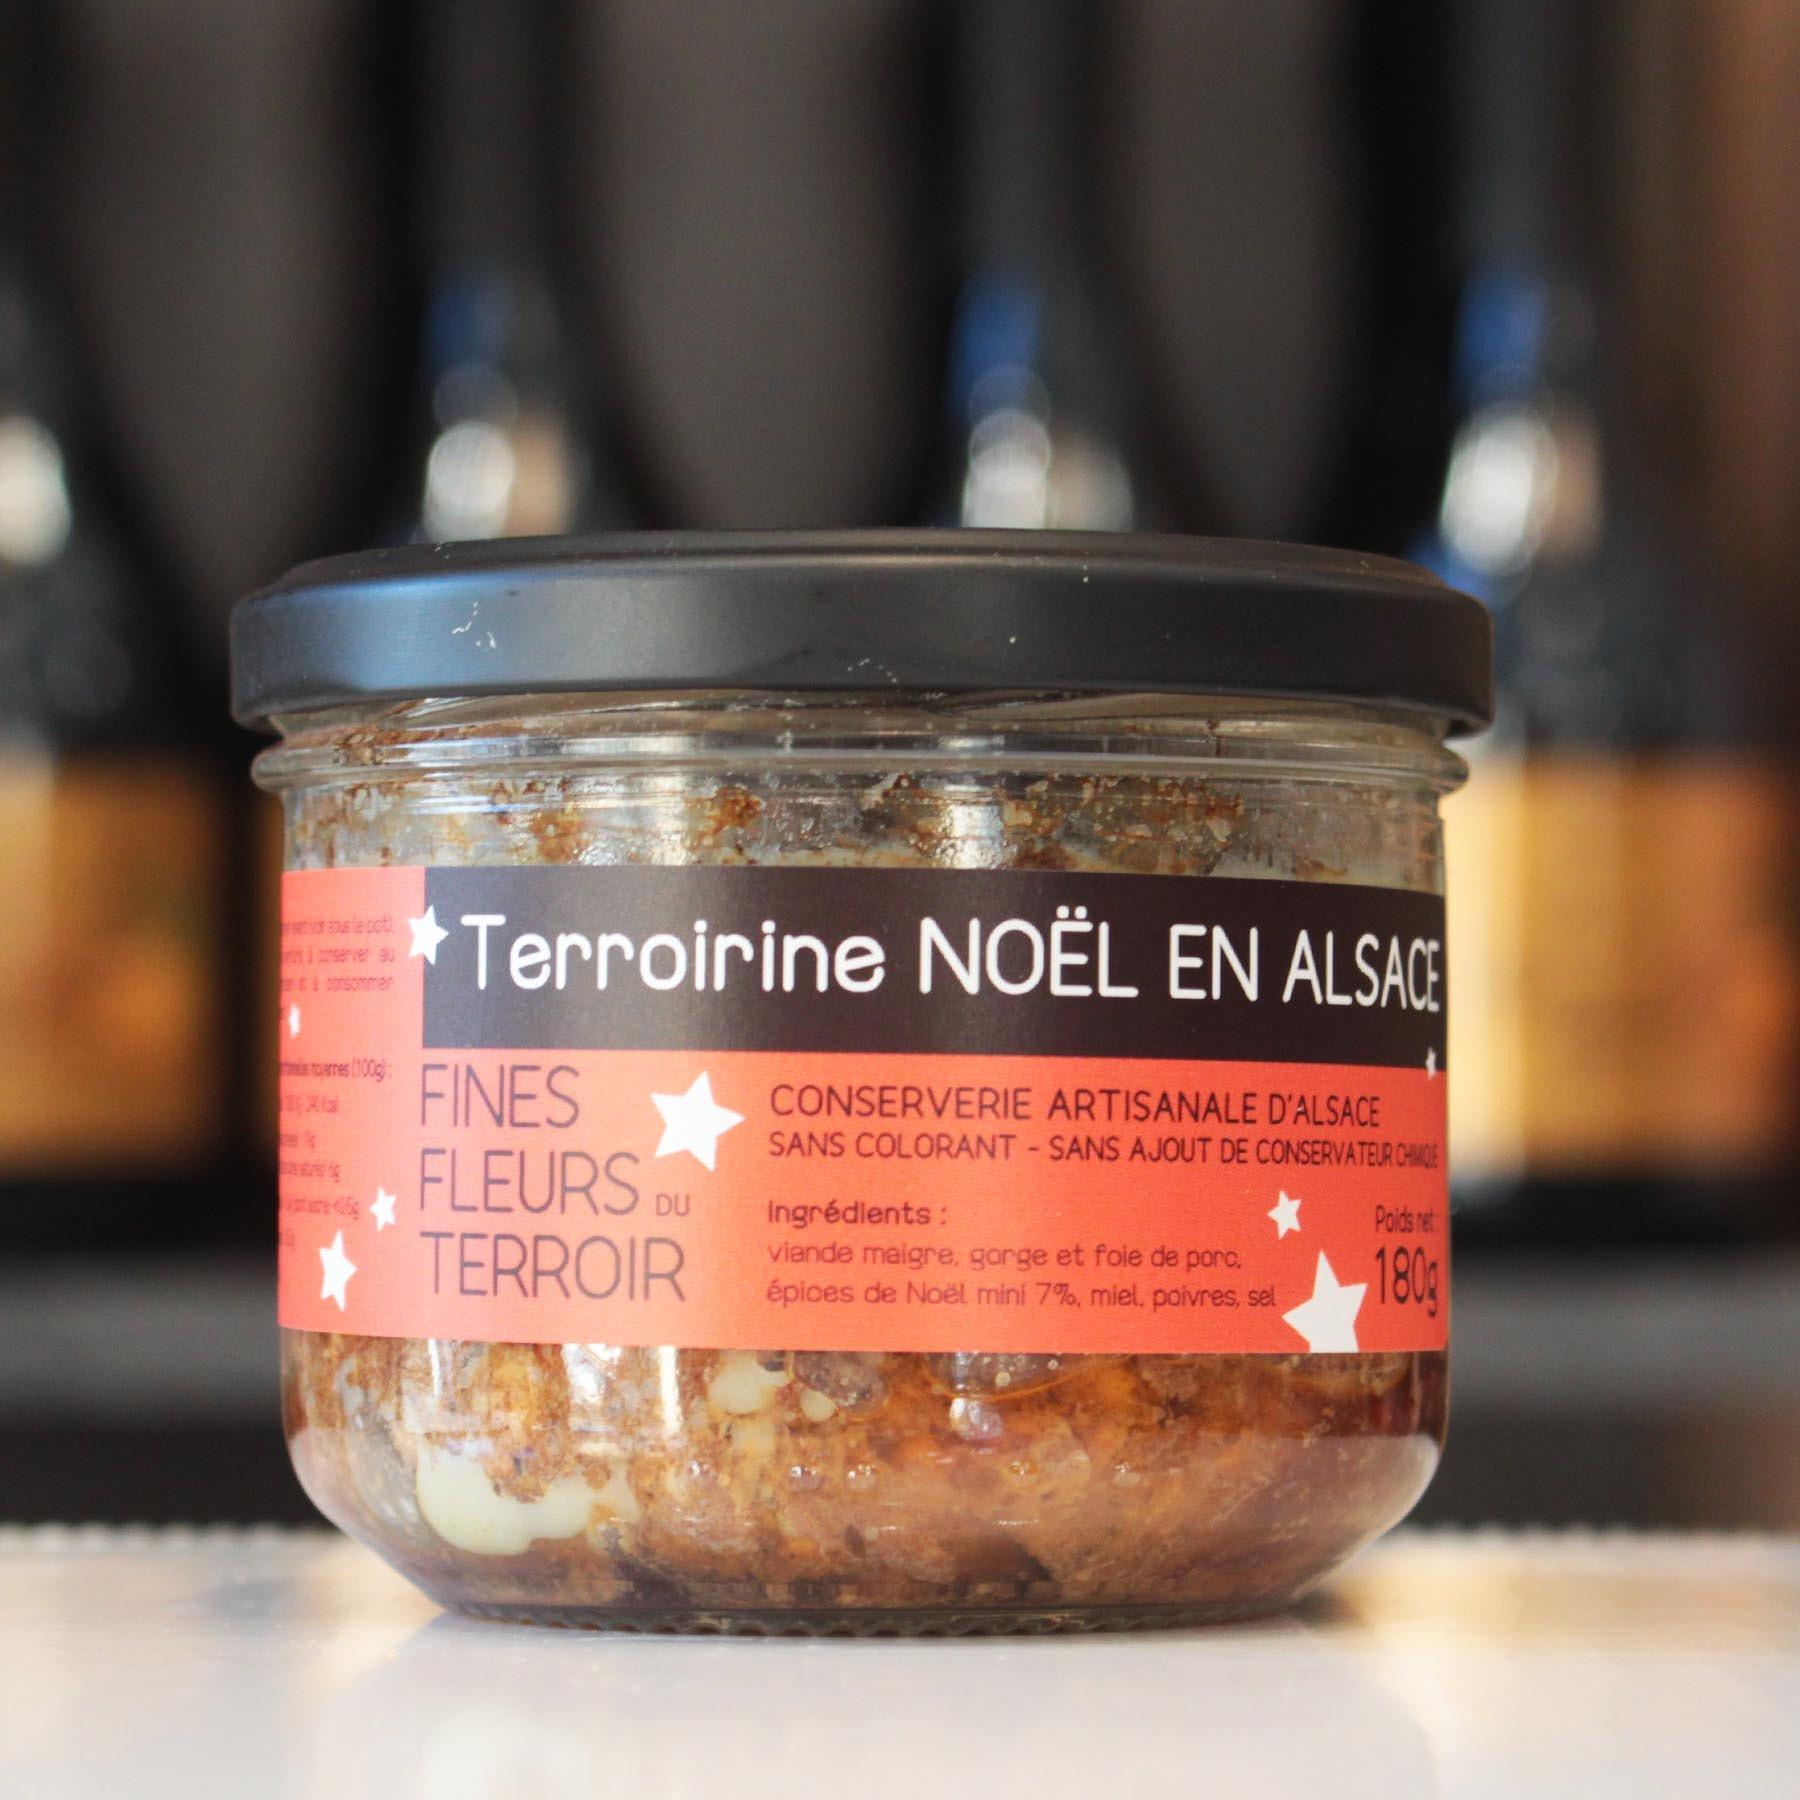 Terroirine Noël en Alsace, 180g